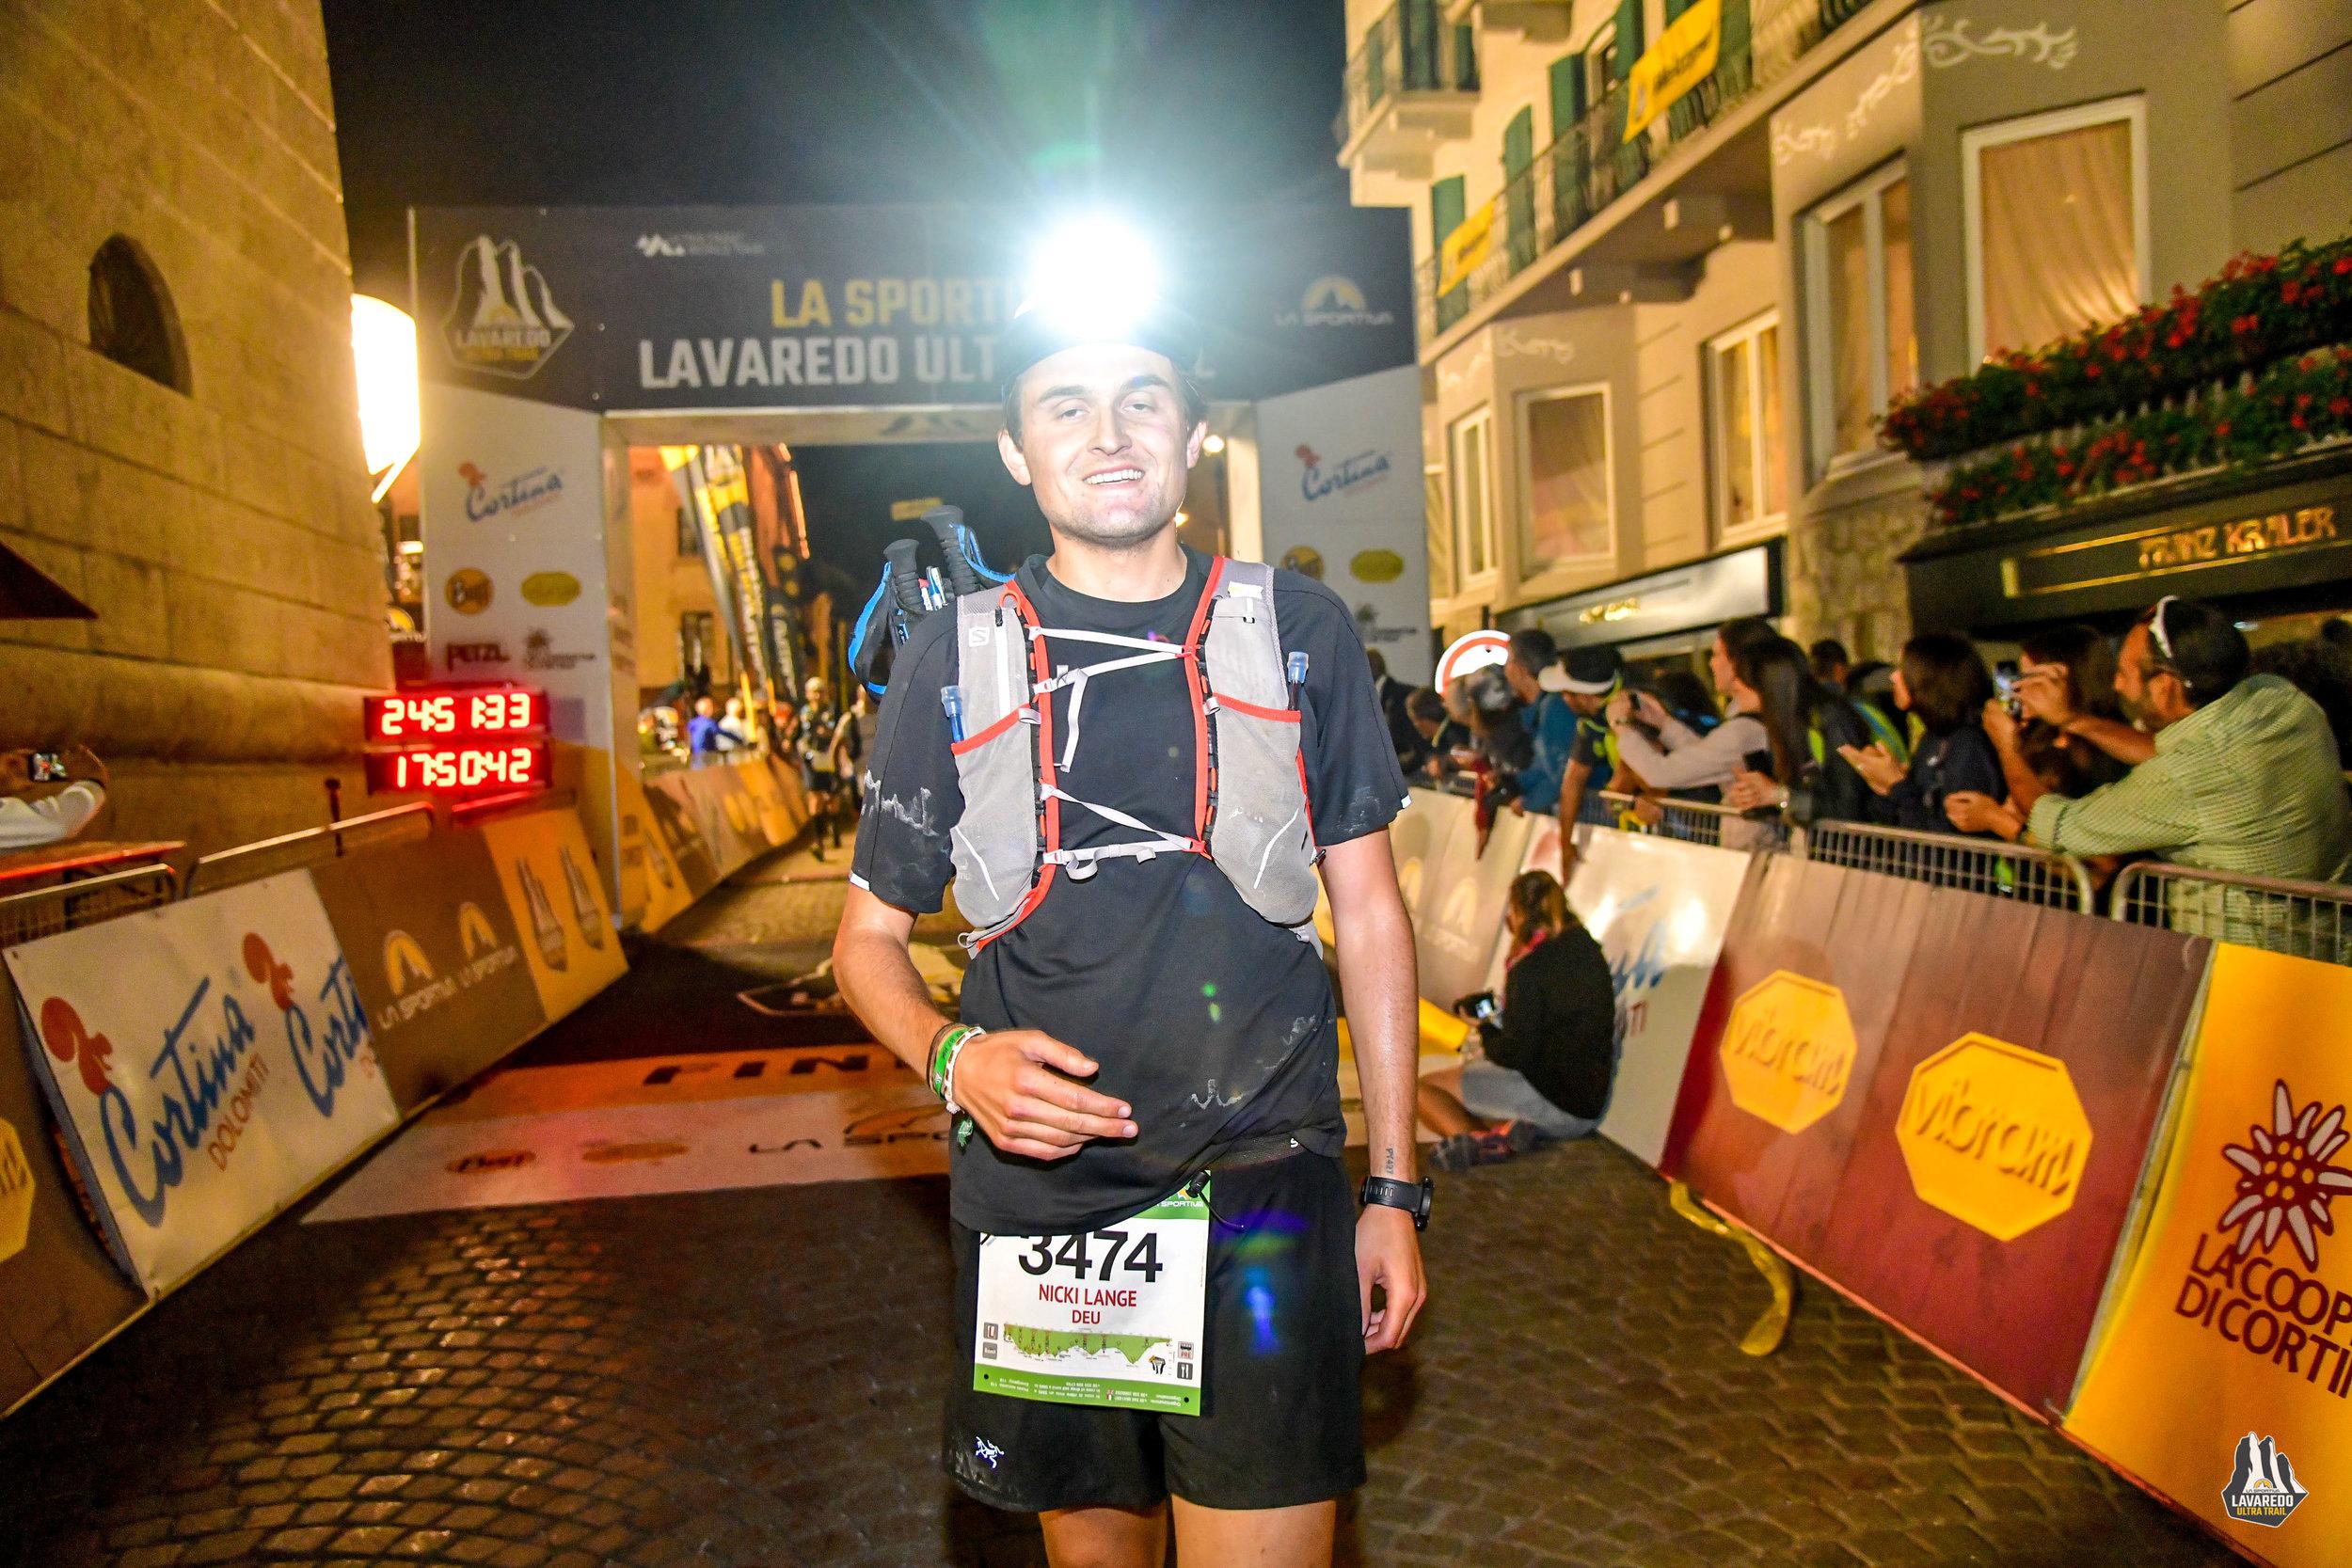 La-Sportiva-Lavaredo-Ultra-Trail-Ultra-Dolomites-2019-12.jpg